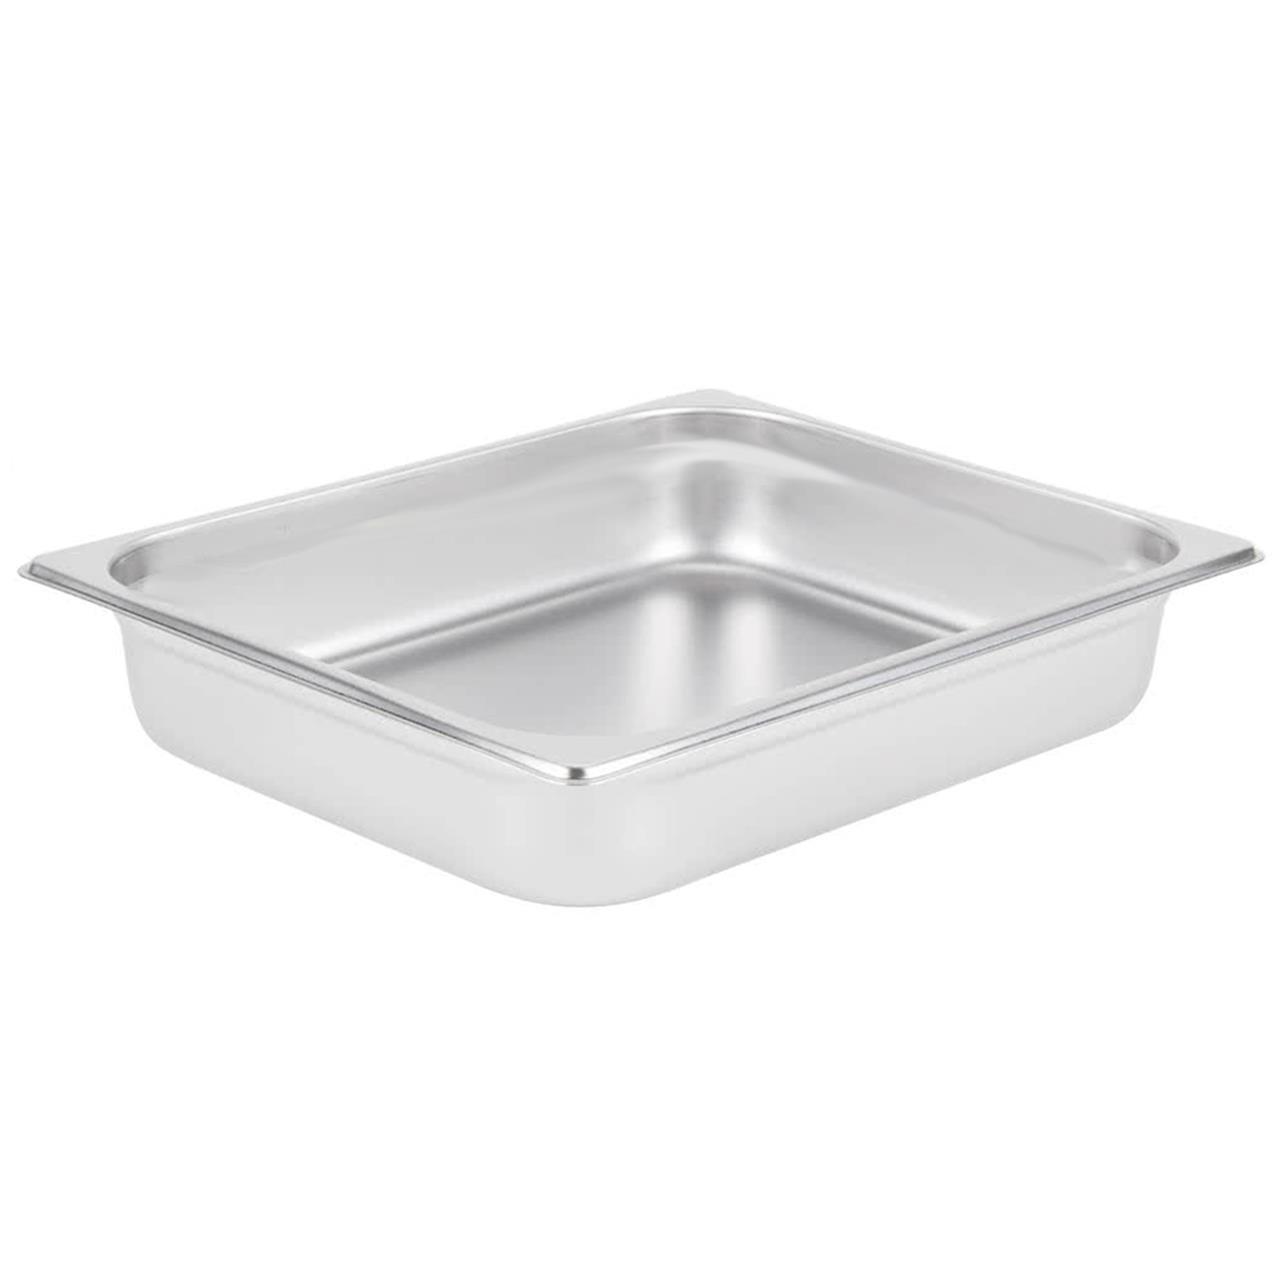 1/2 Stainless Steel Steam Pan